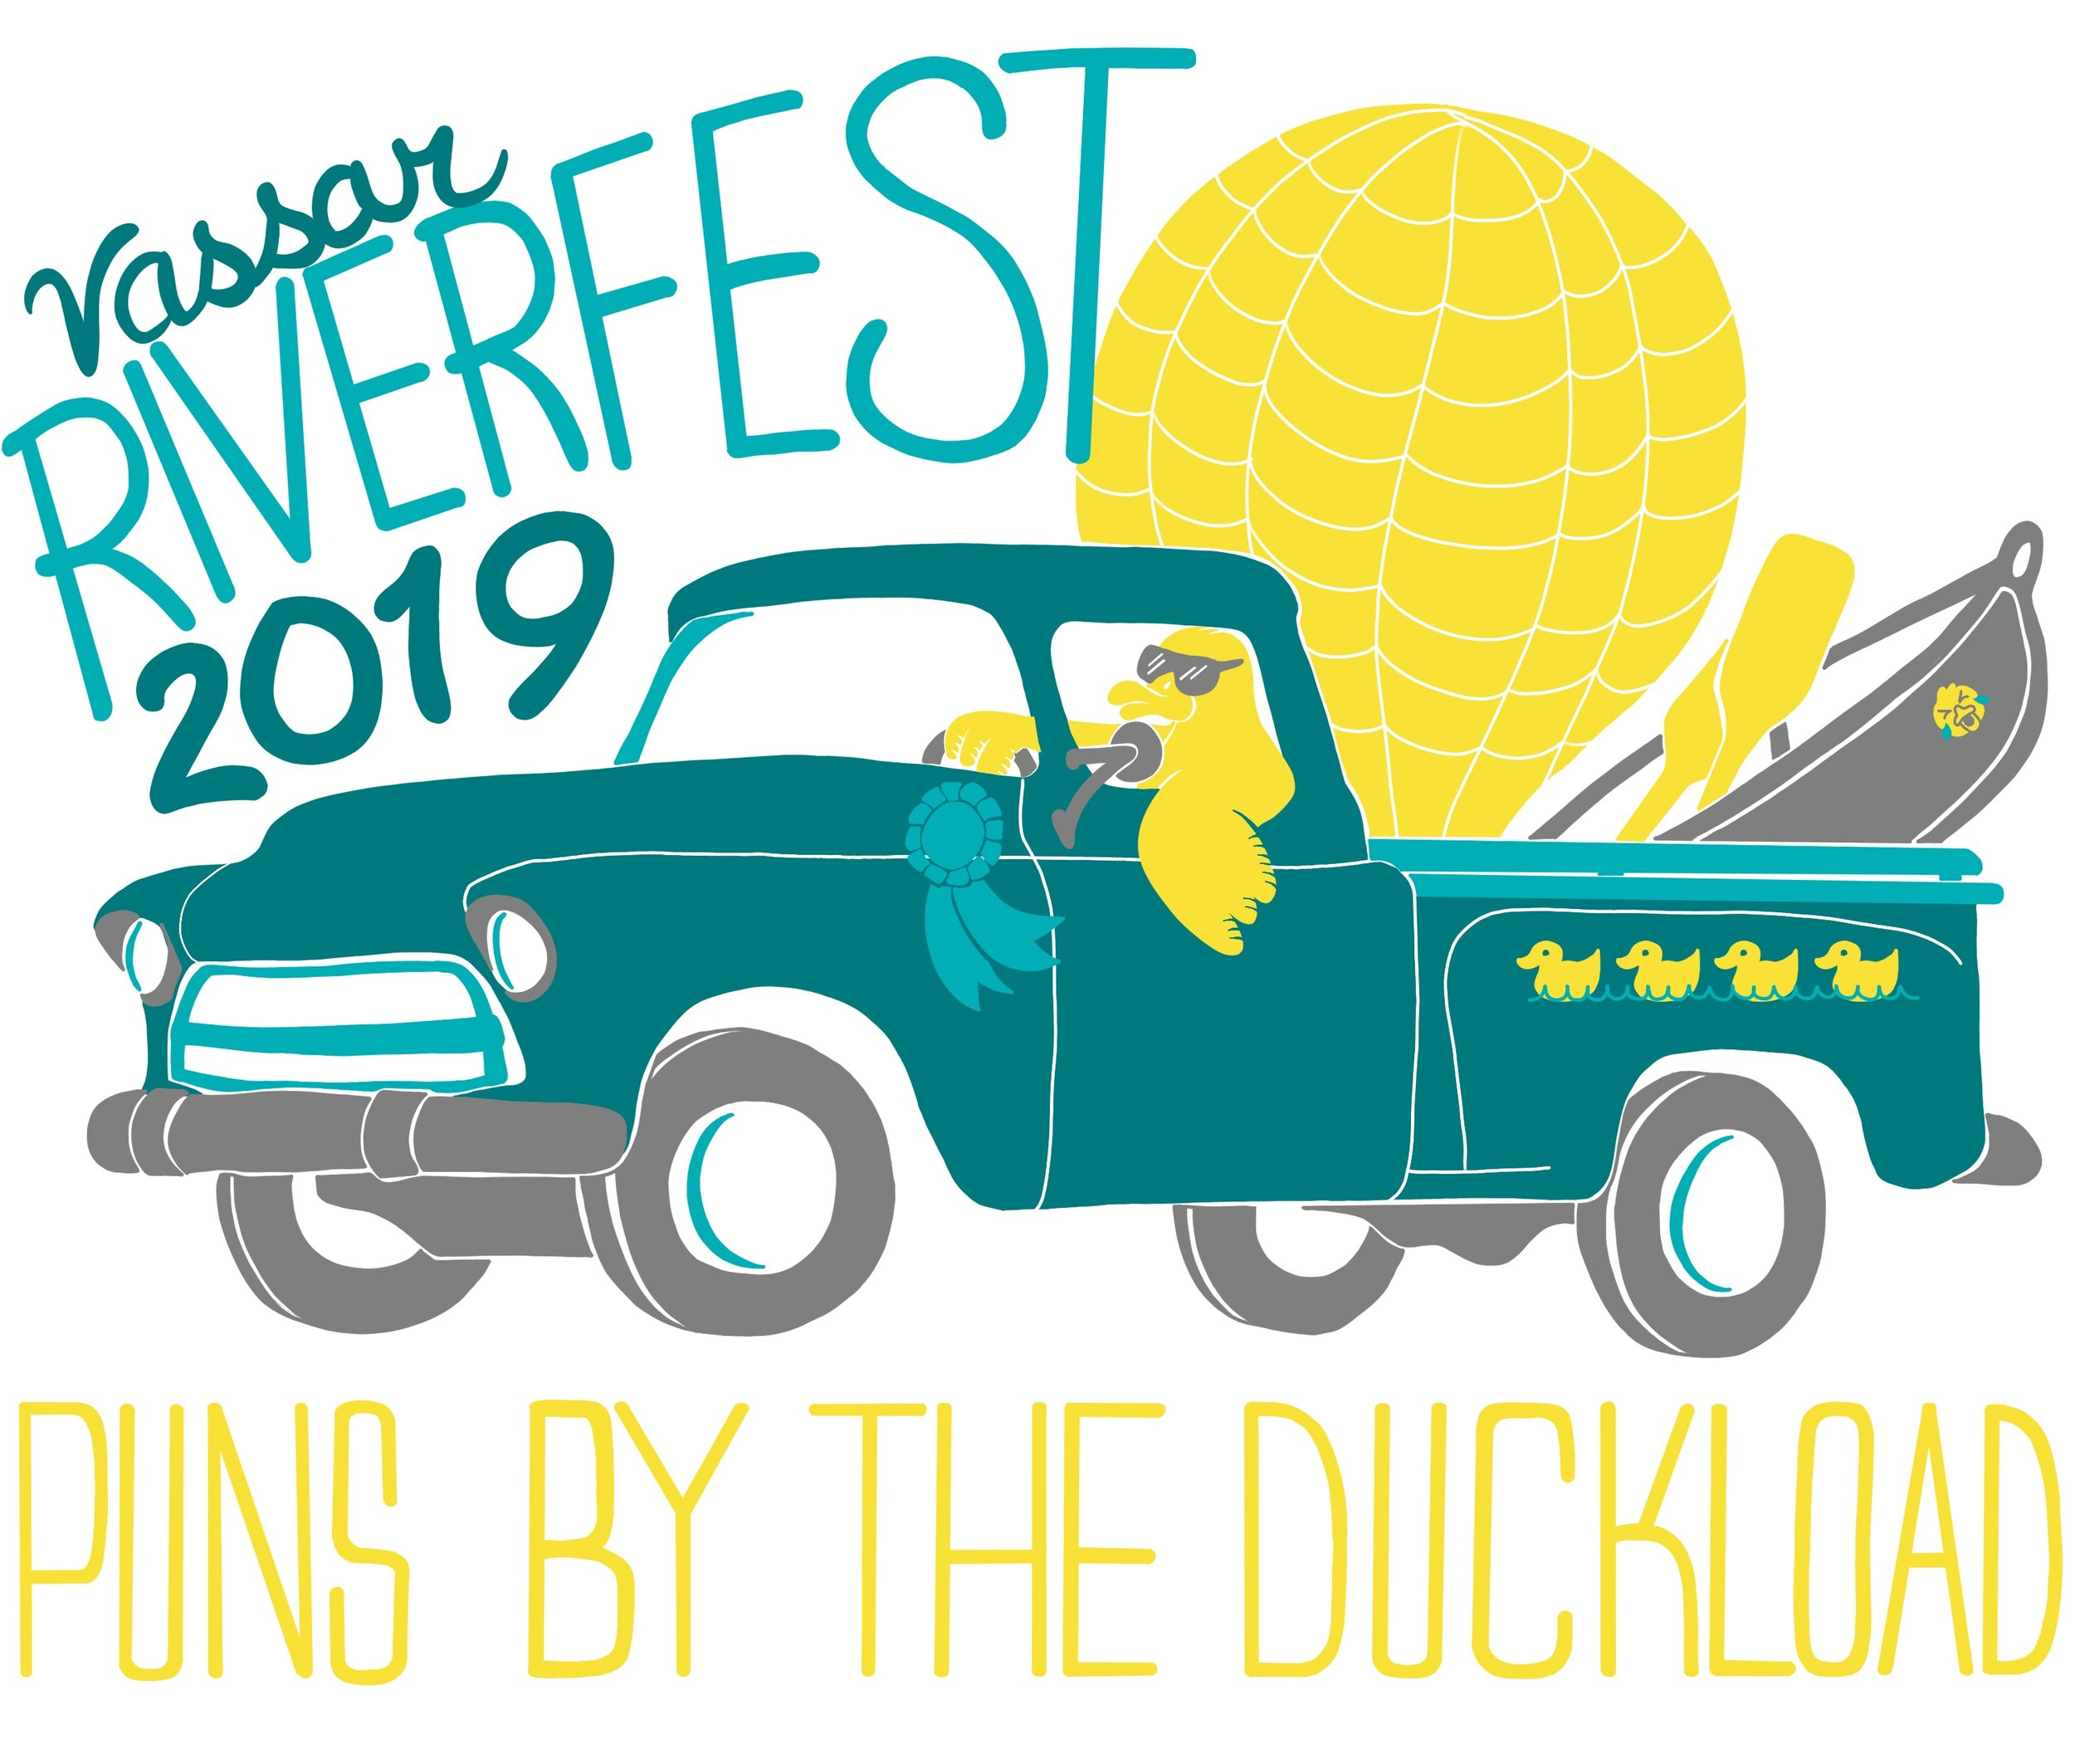 Riverfest 2019 logo